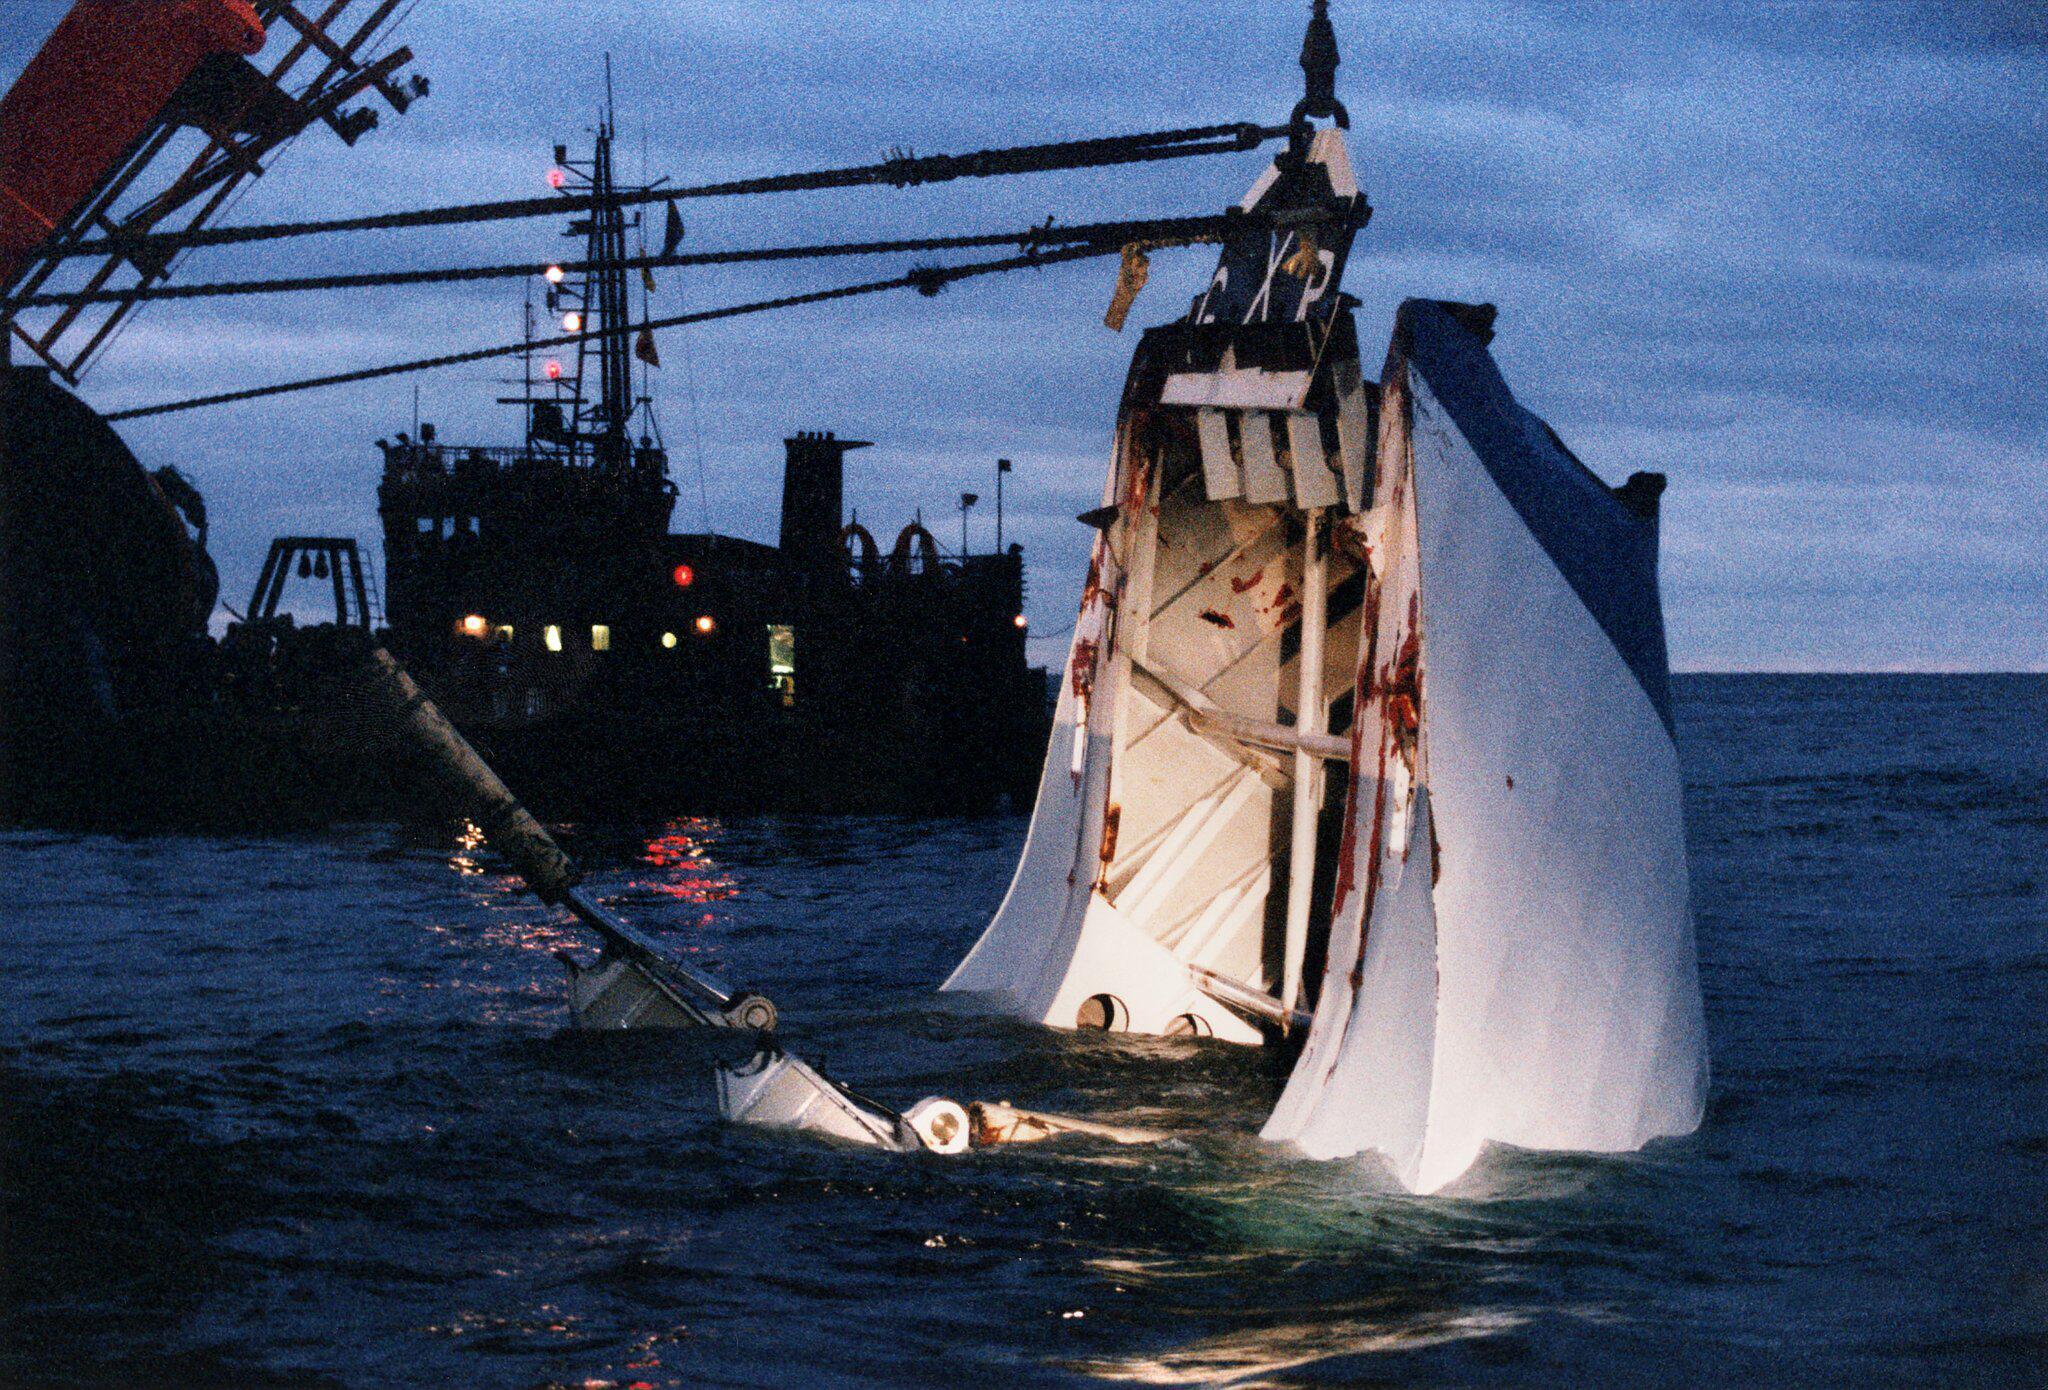 Bild zu 25 Jahre «Estonia»-Katastrophe